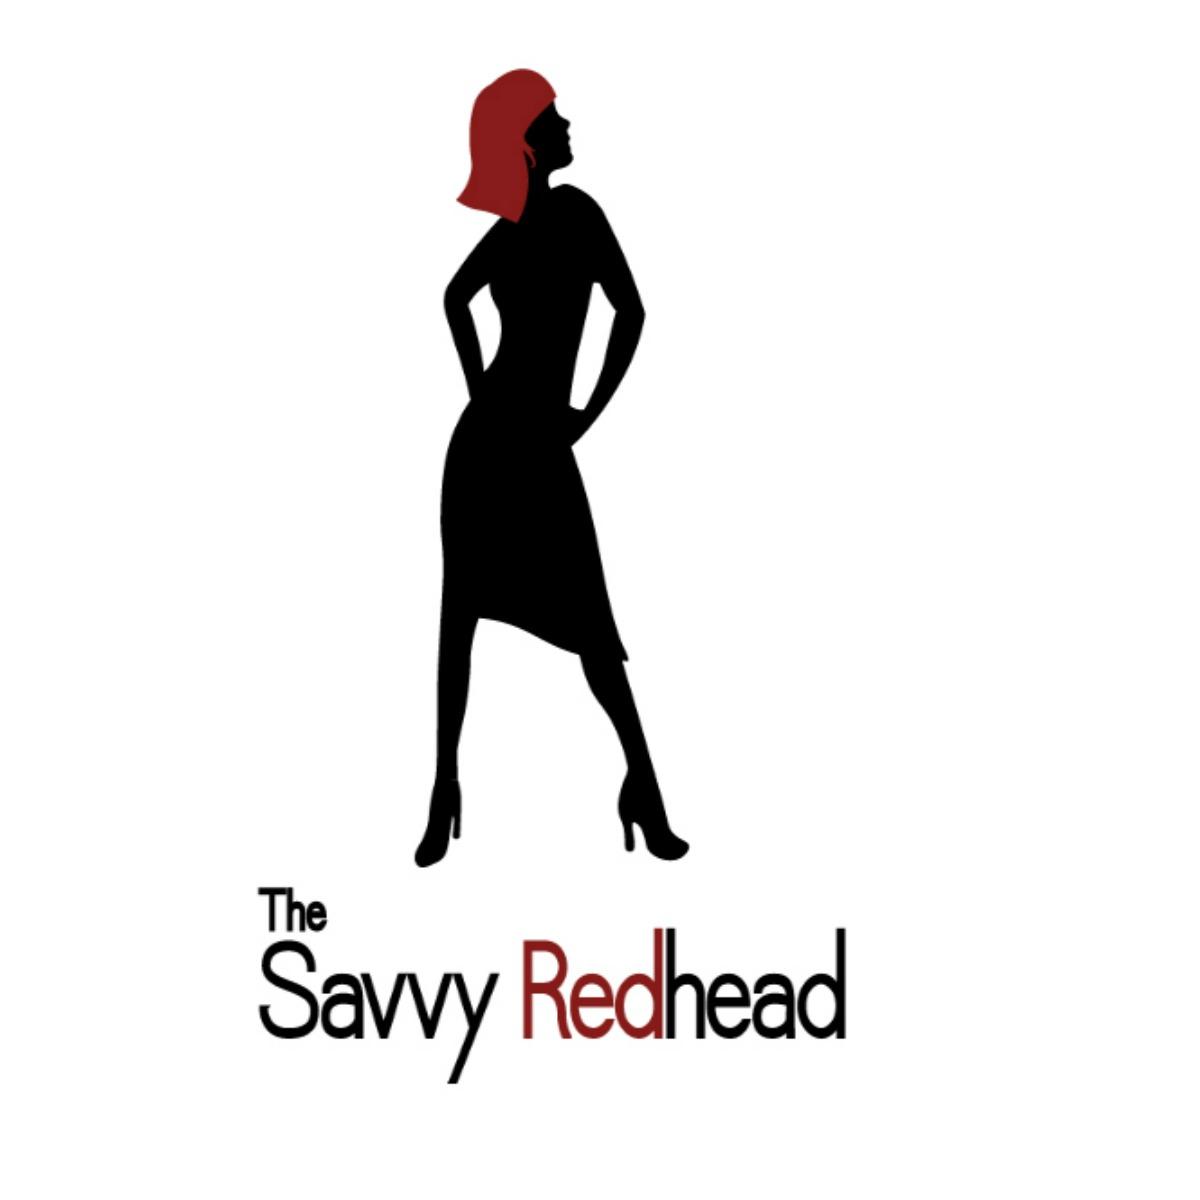 The Savvy Redhead